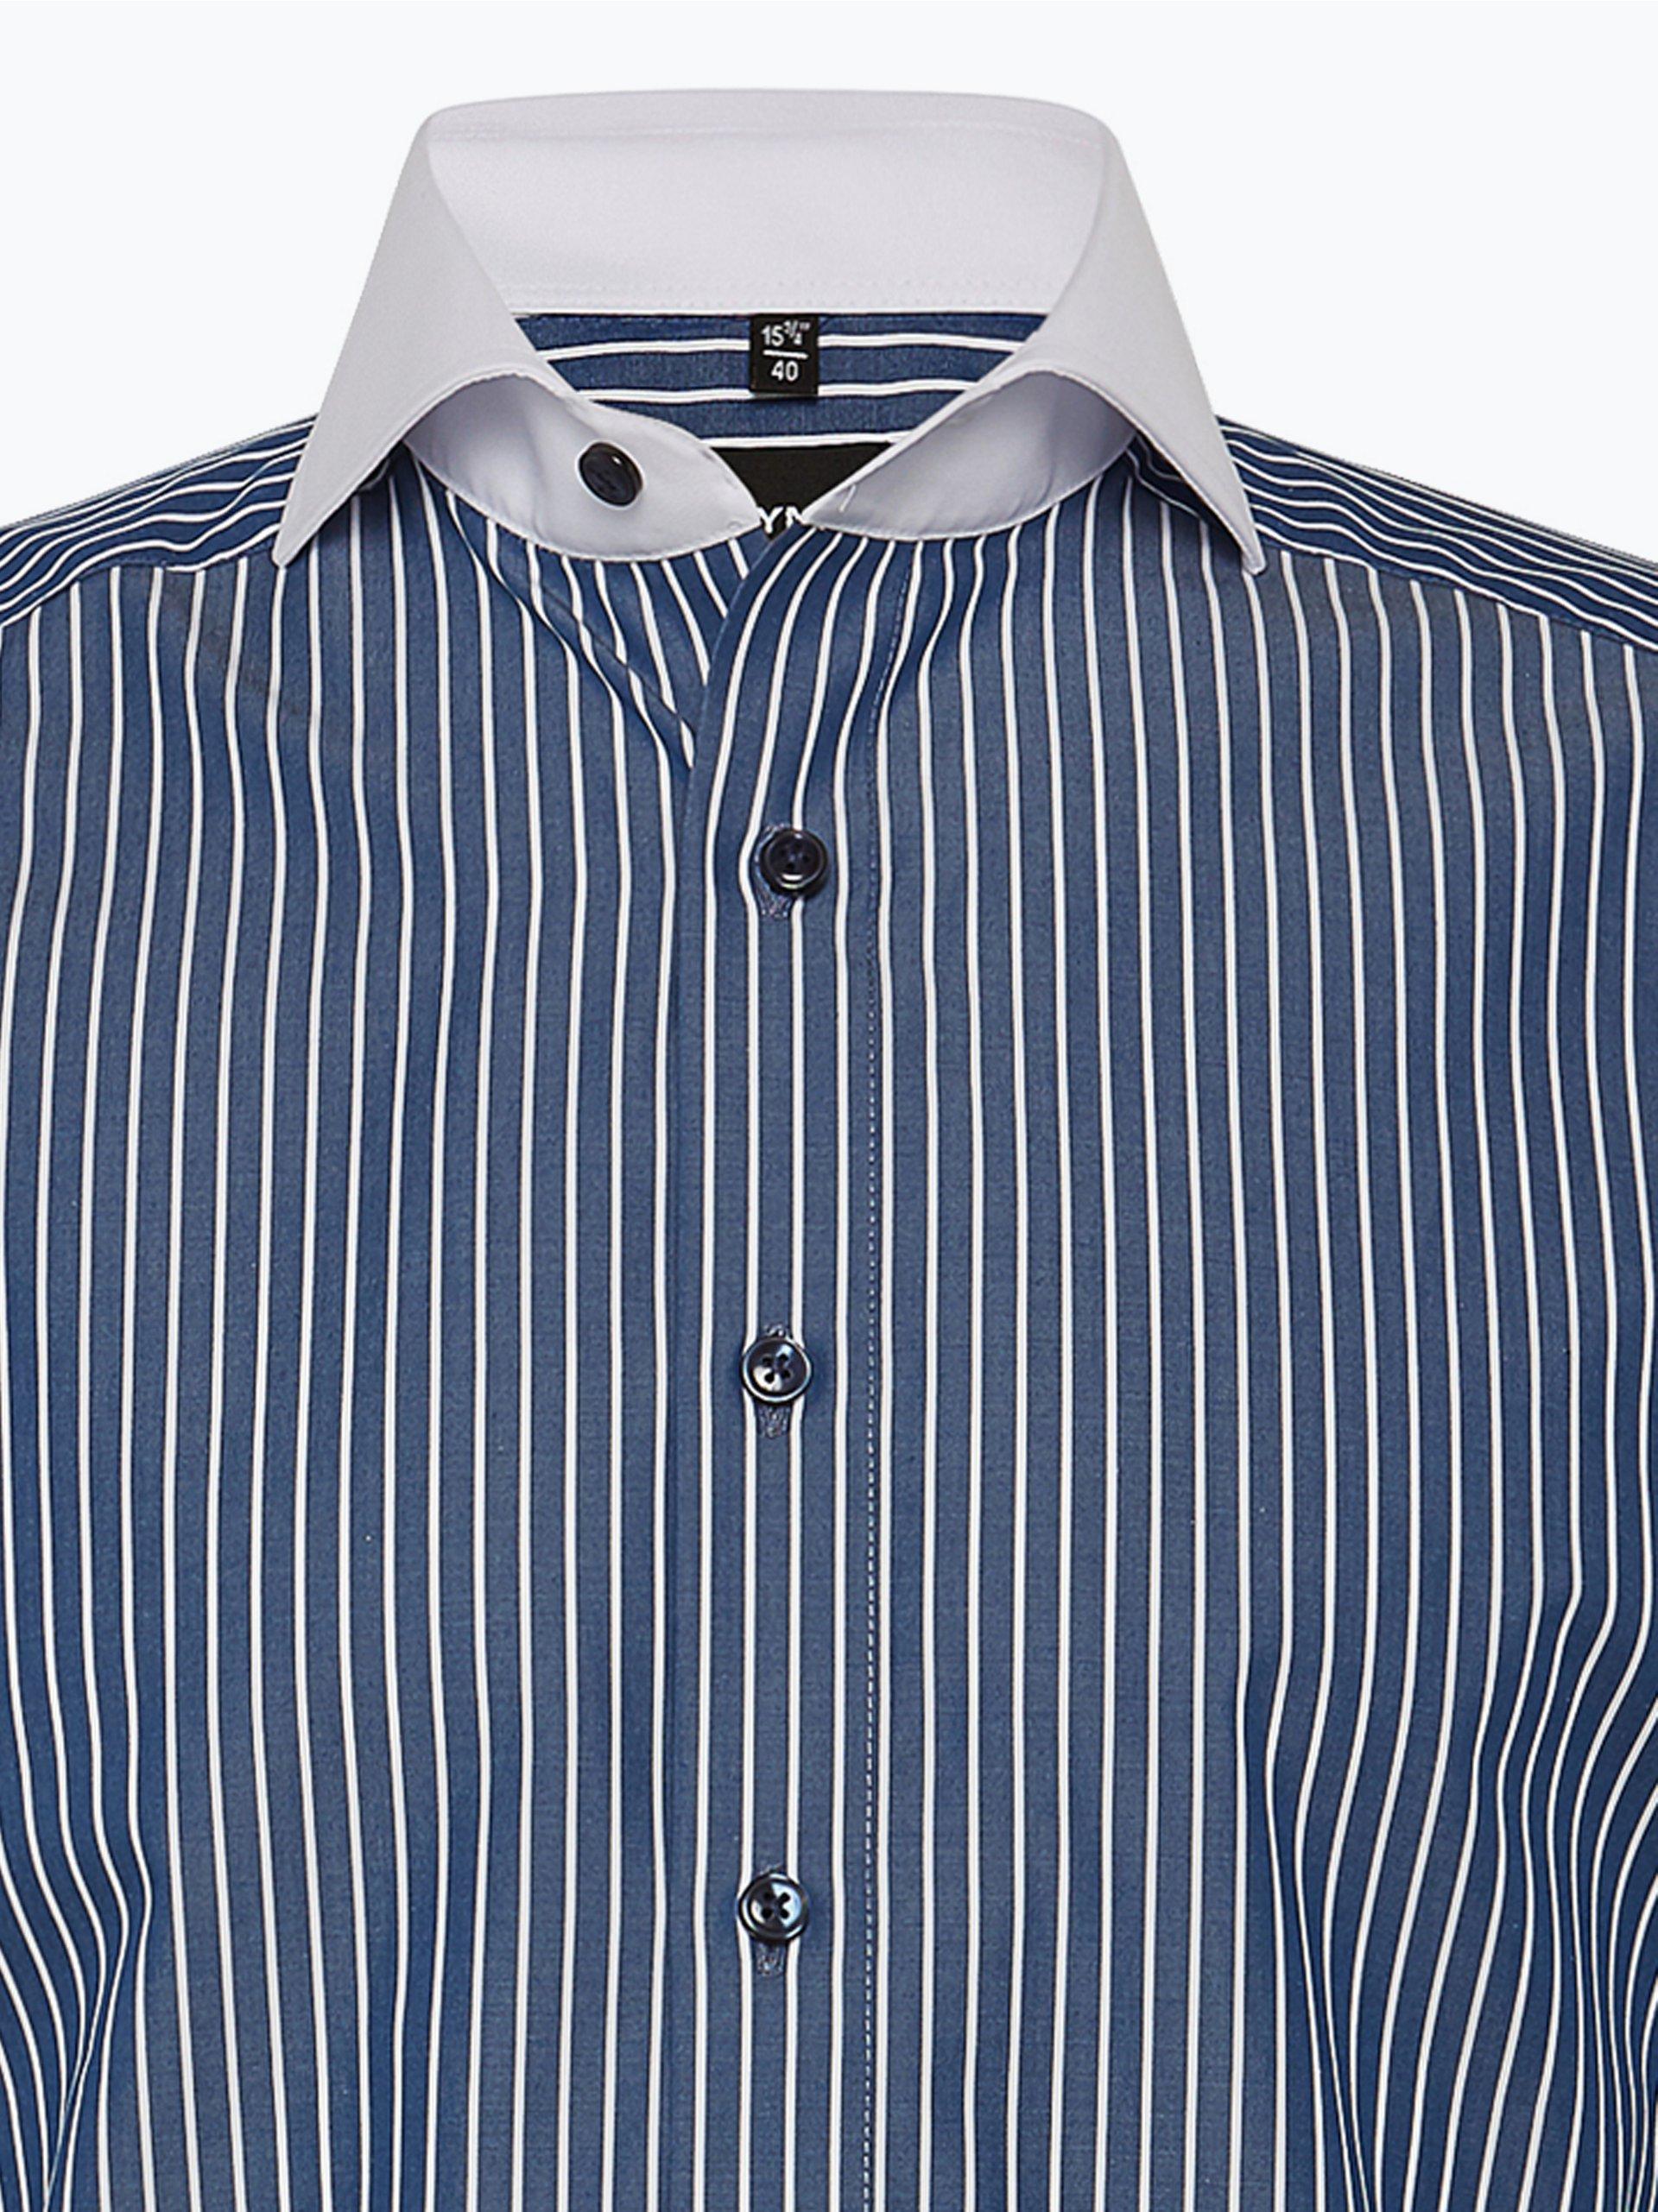 olymp modern fit herren hemd marine blau gestreift online. Black Bedroom Furniture Sets. Home Design Ideas